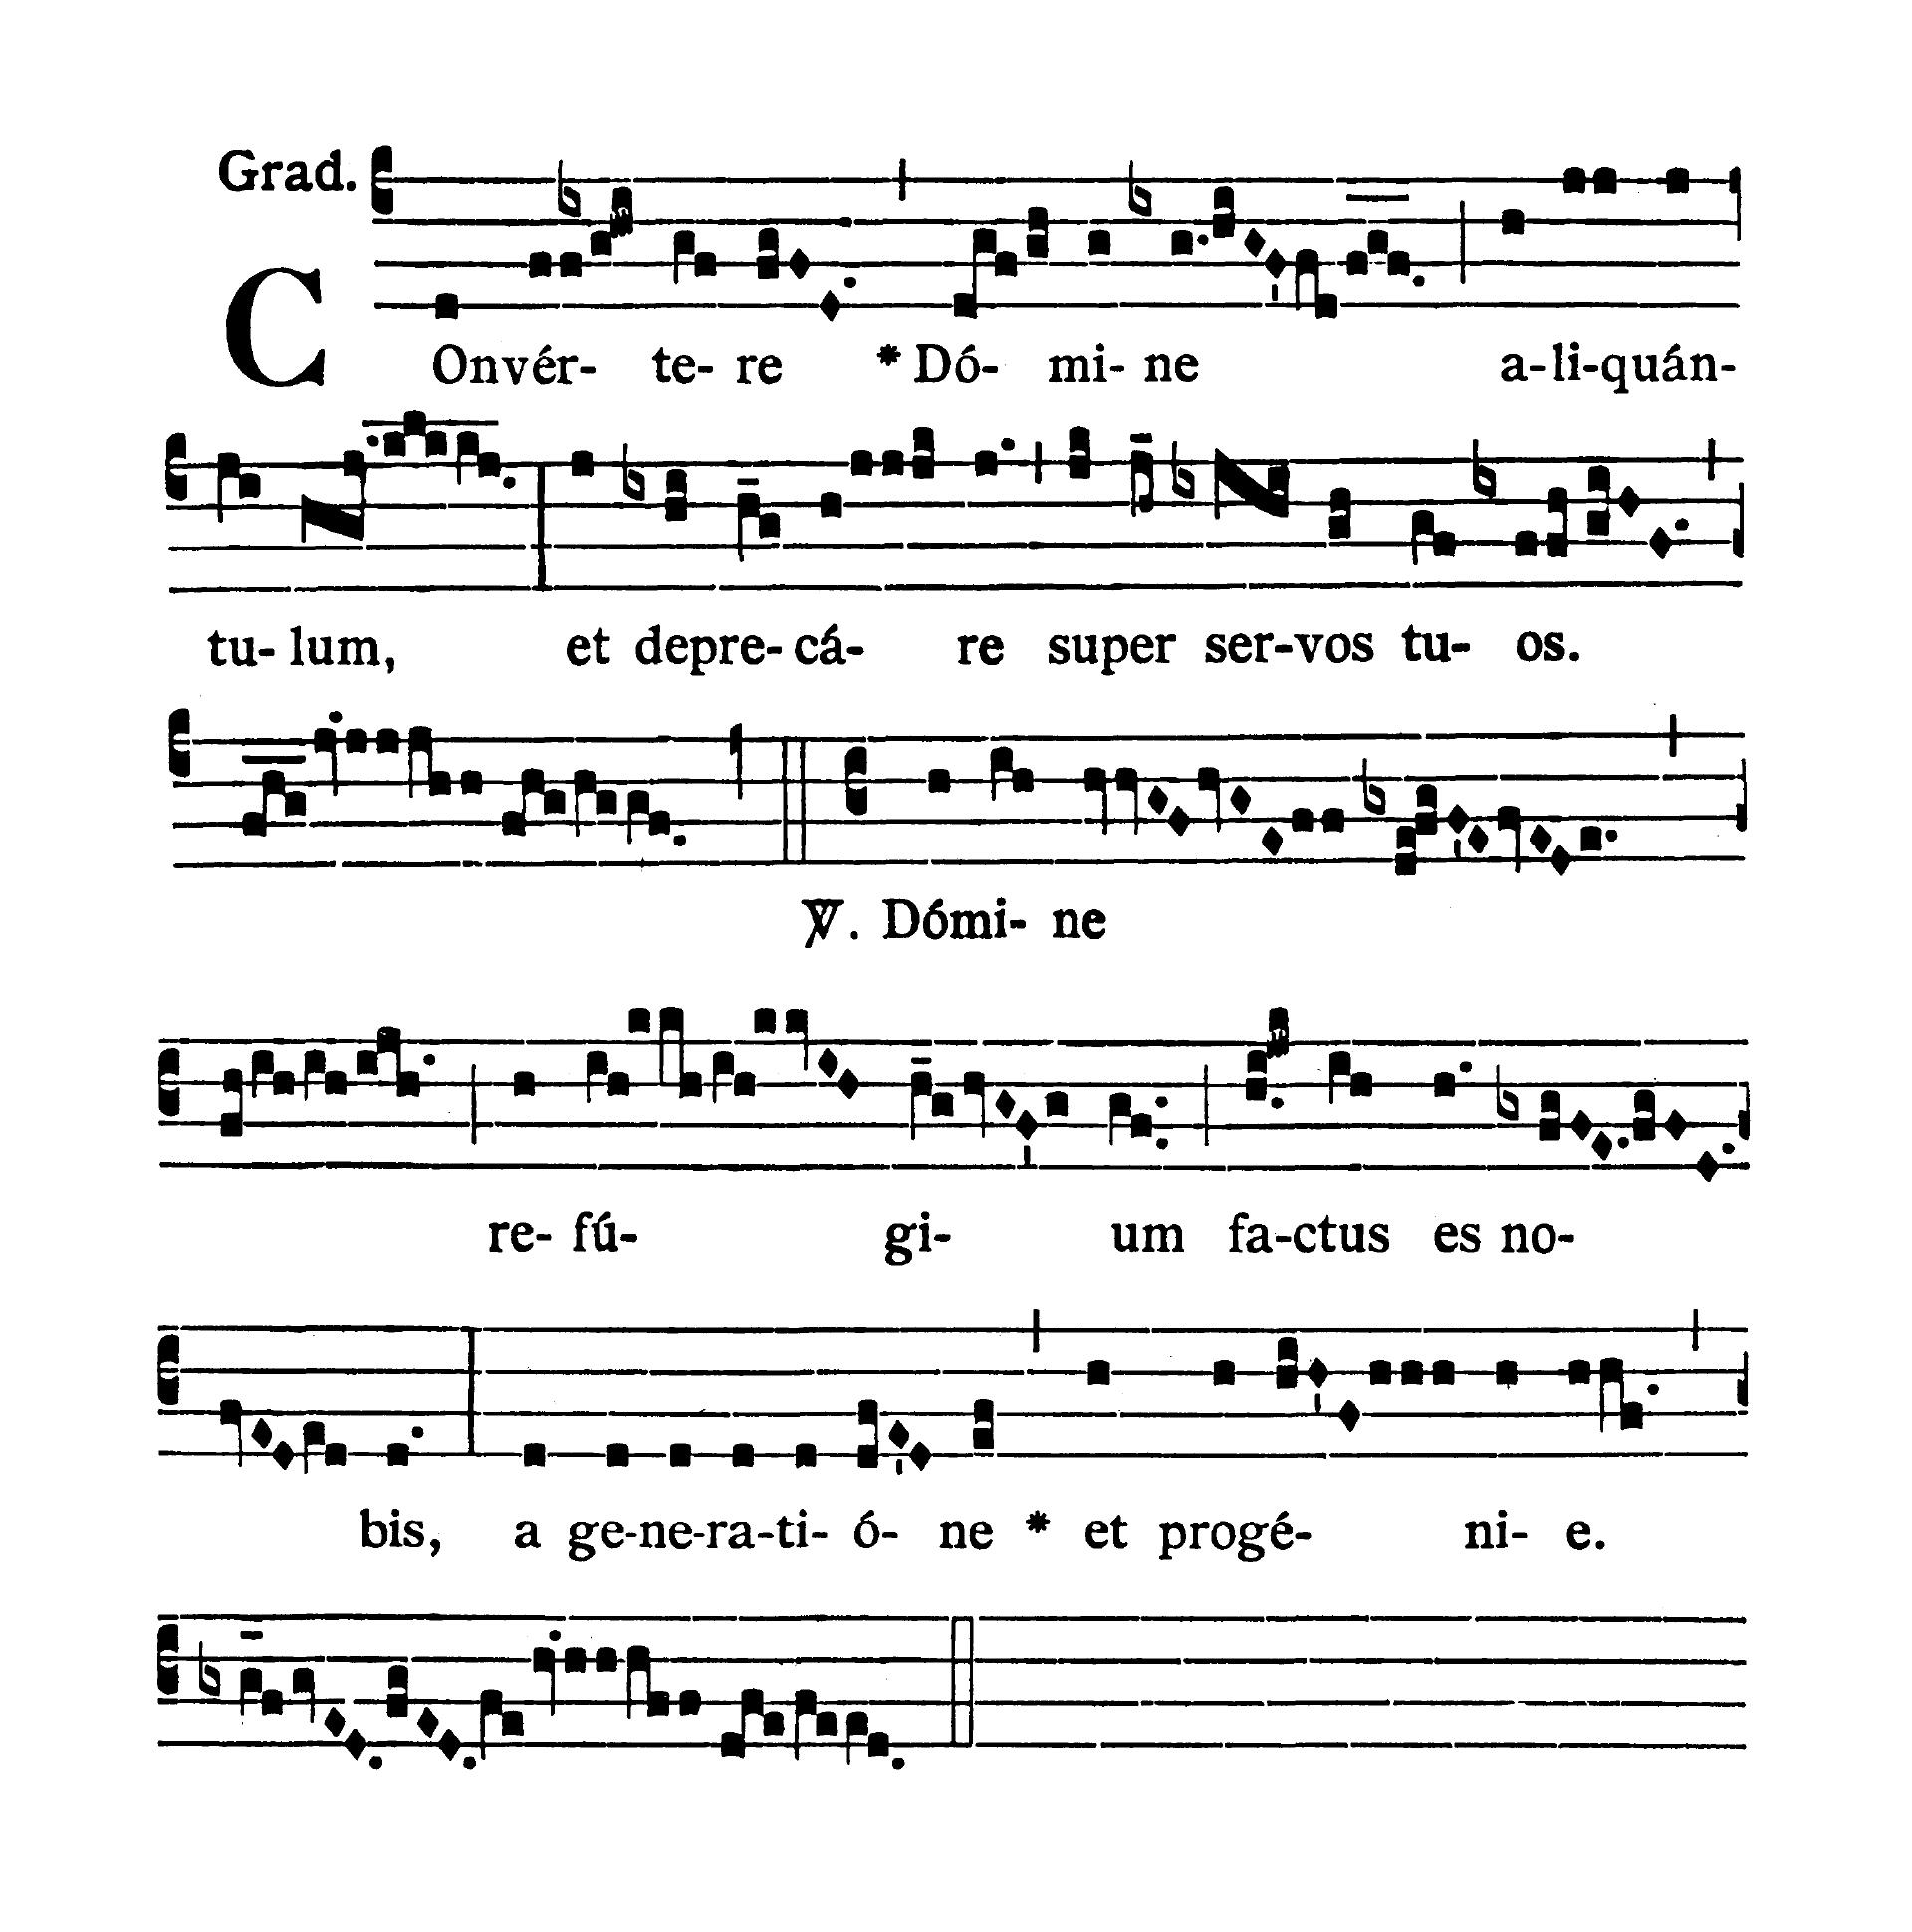 Feria VI Quatuor Temporum Septembris (Piątek suchych dni wrześniowych) - Graduale (Convertere Domine)